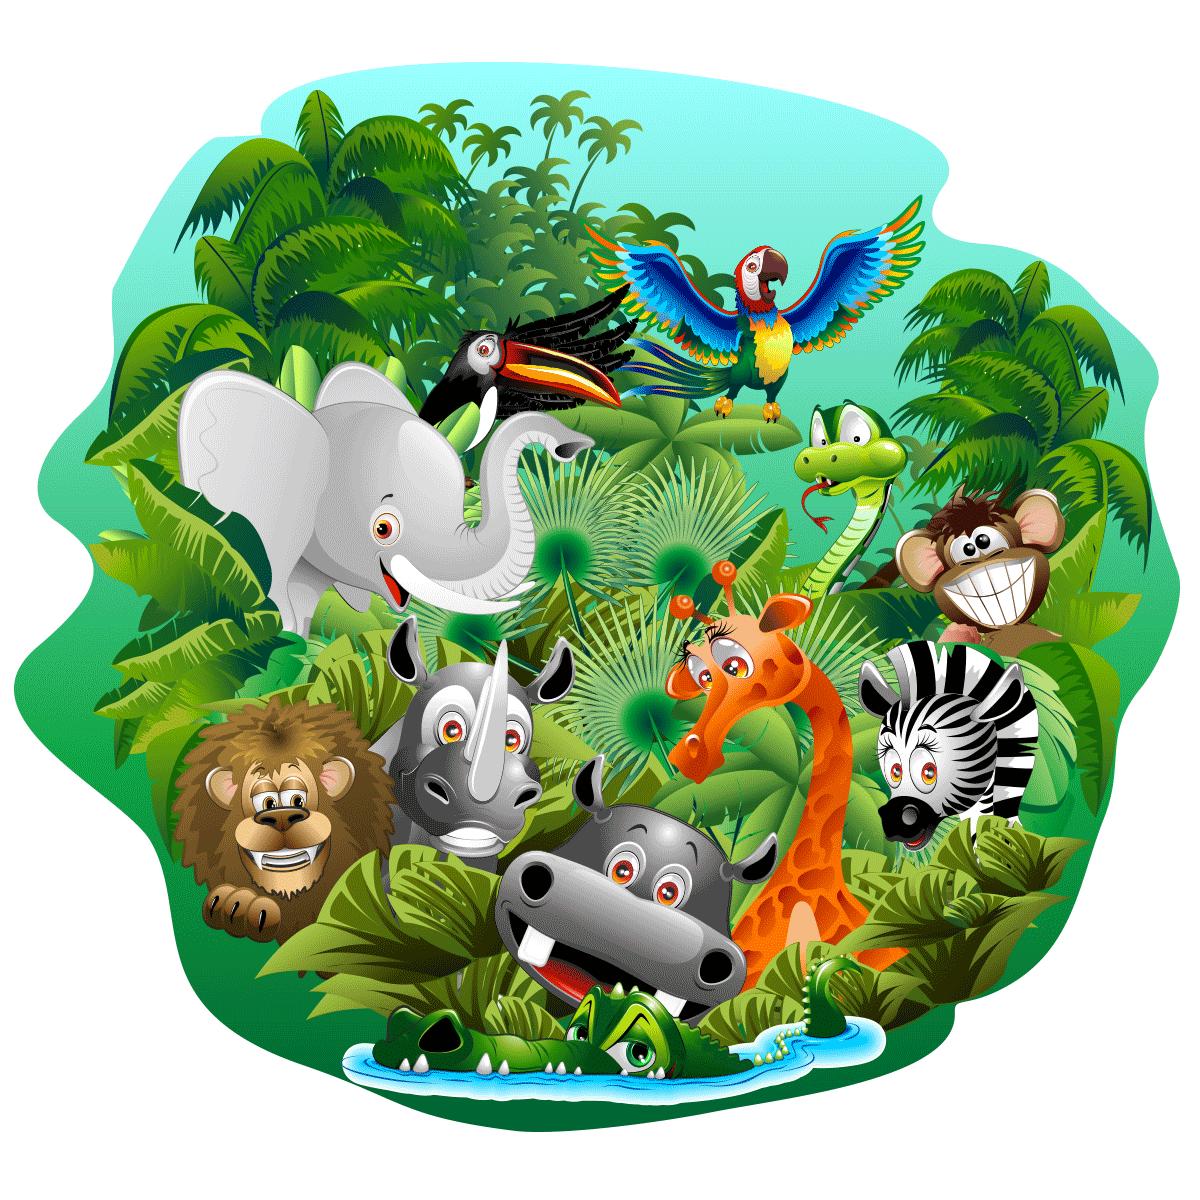 Sticker animaux de la jungle en f te stickers animaux - Animaux de la jungle maternelle ...